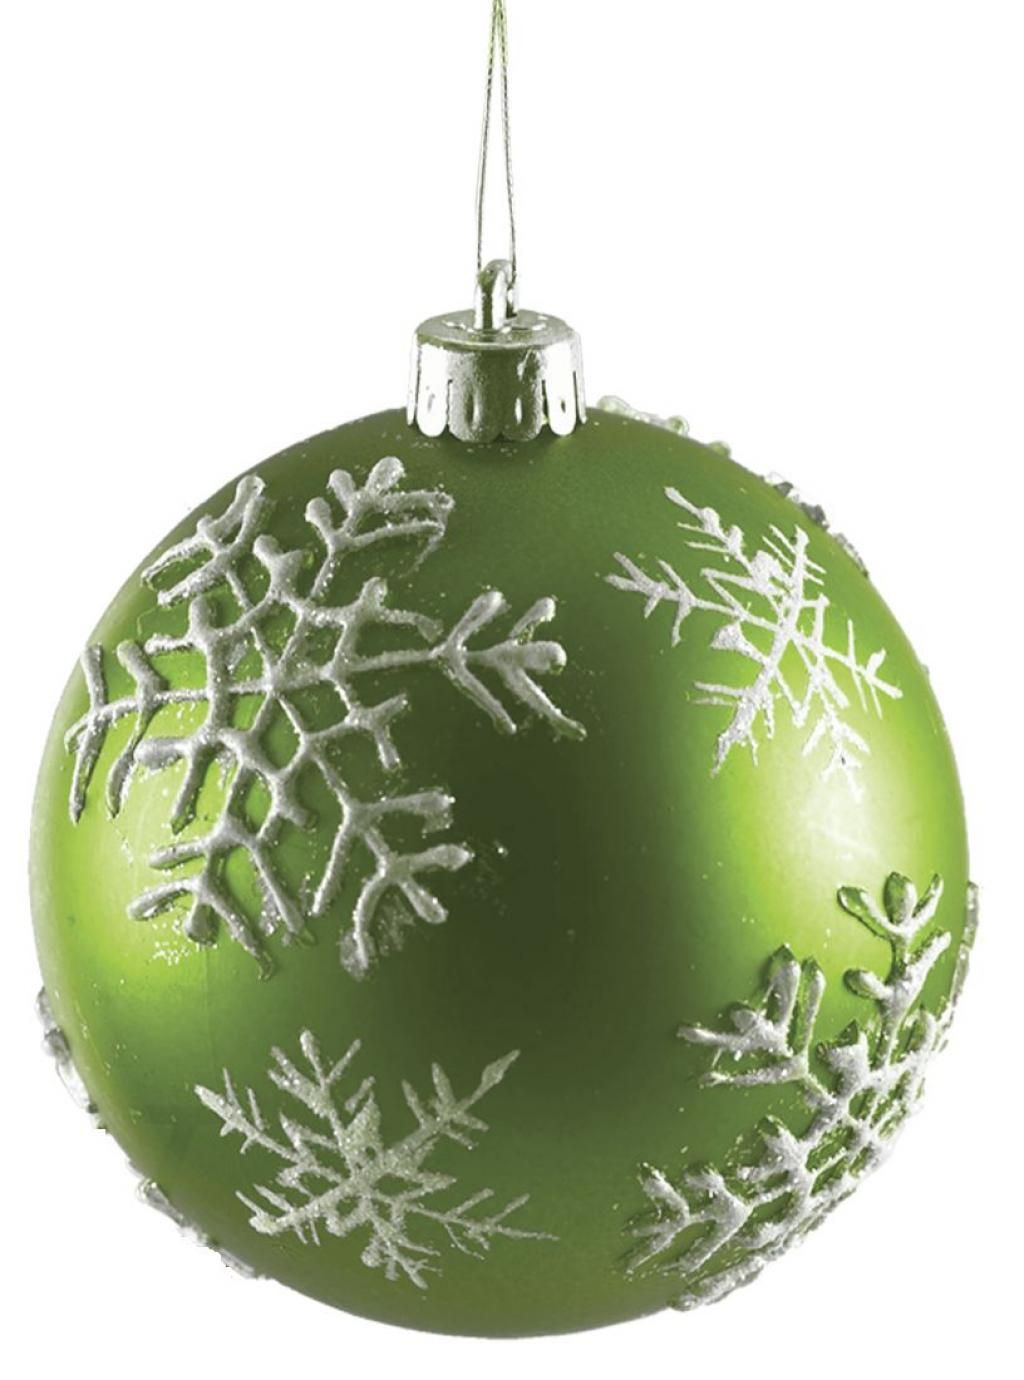 Unique Ornaments google image result for http://www.archigator/pictures/unique